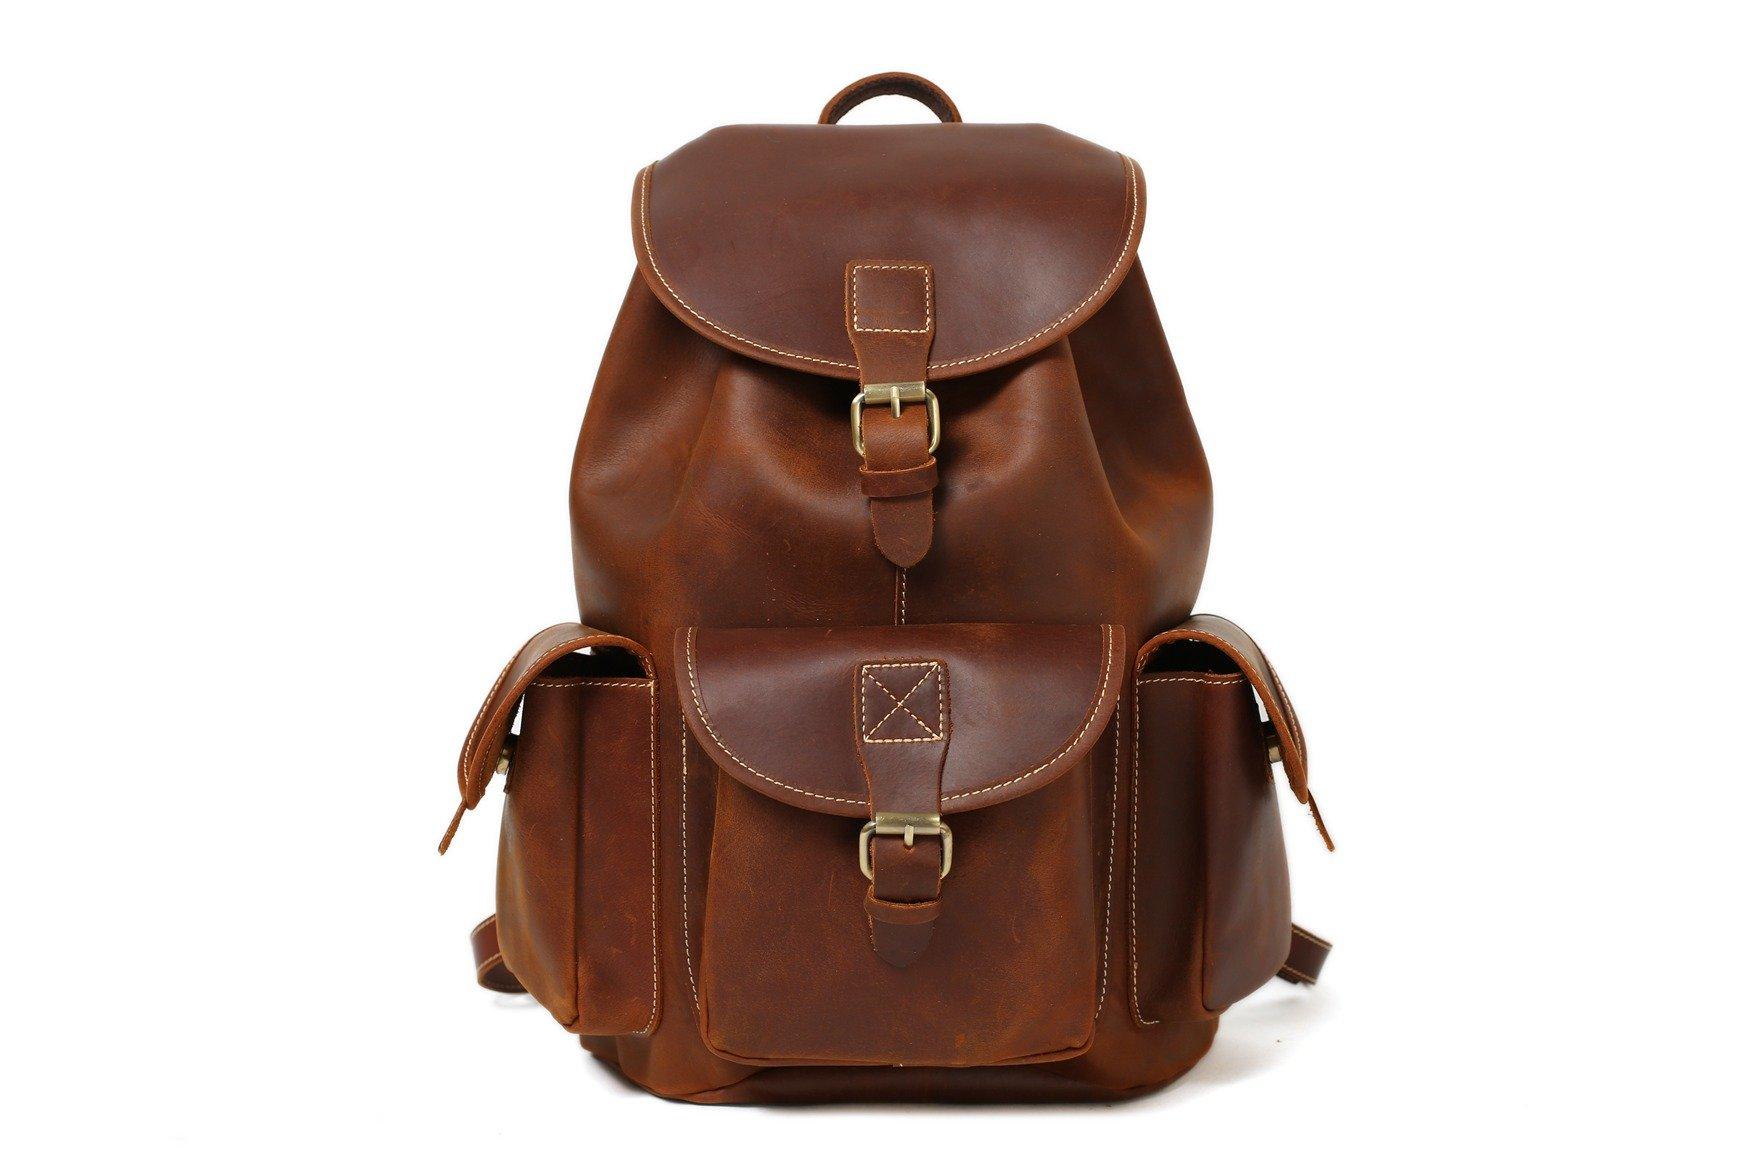 Handmade Vintage Leather Backpack / College Backpack /School Backpack 8891